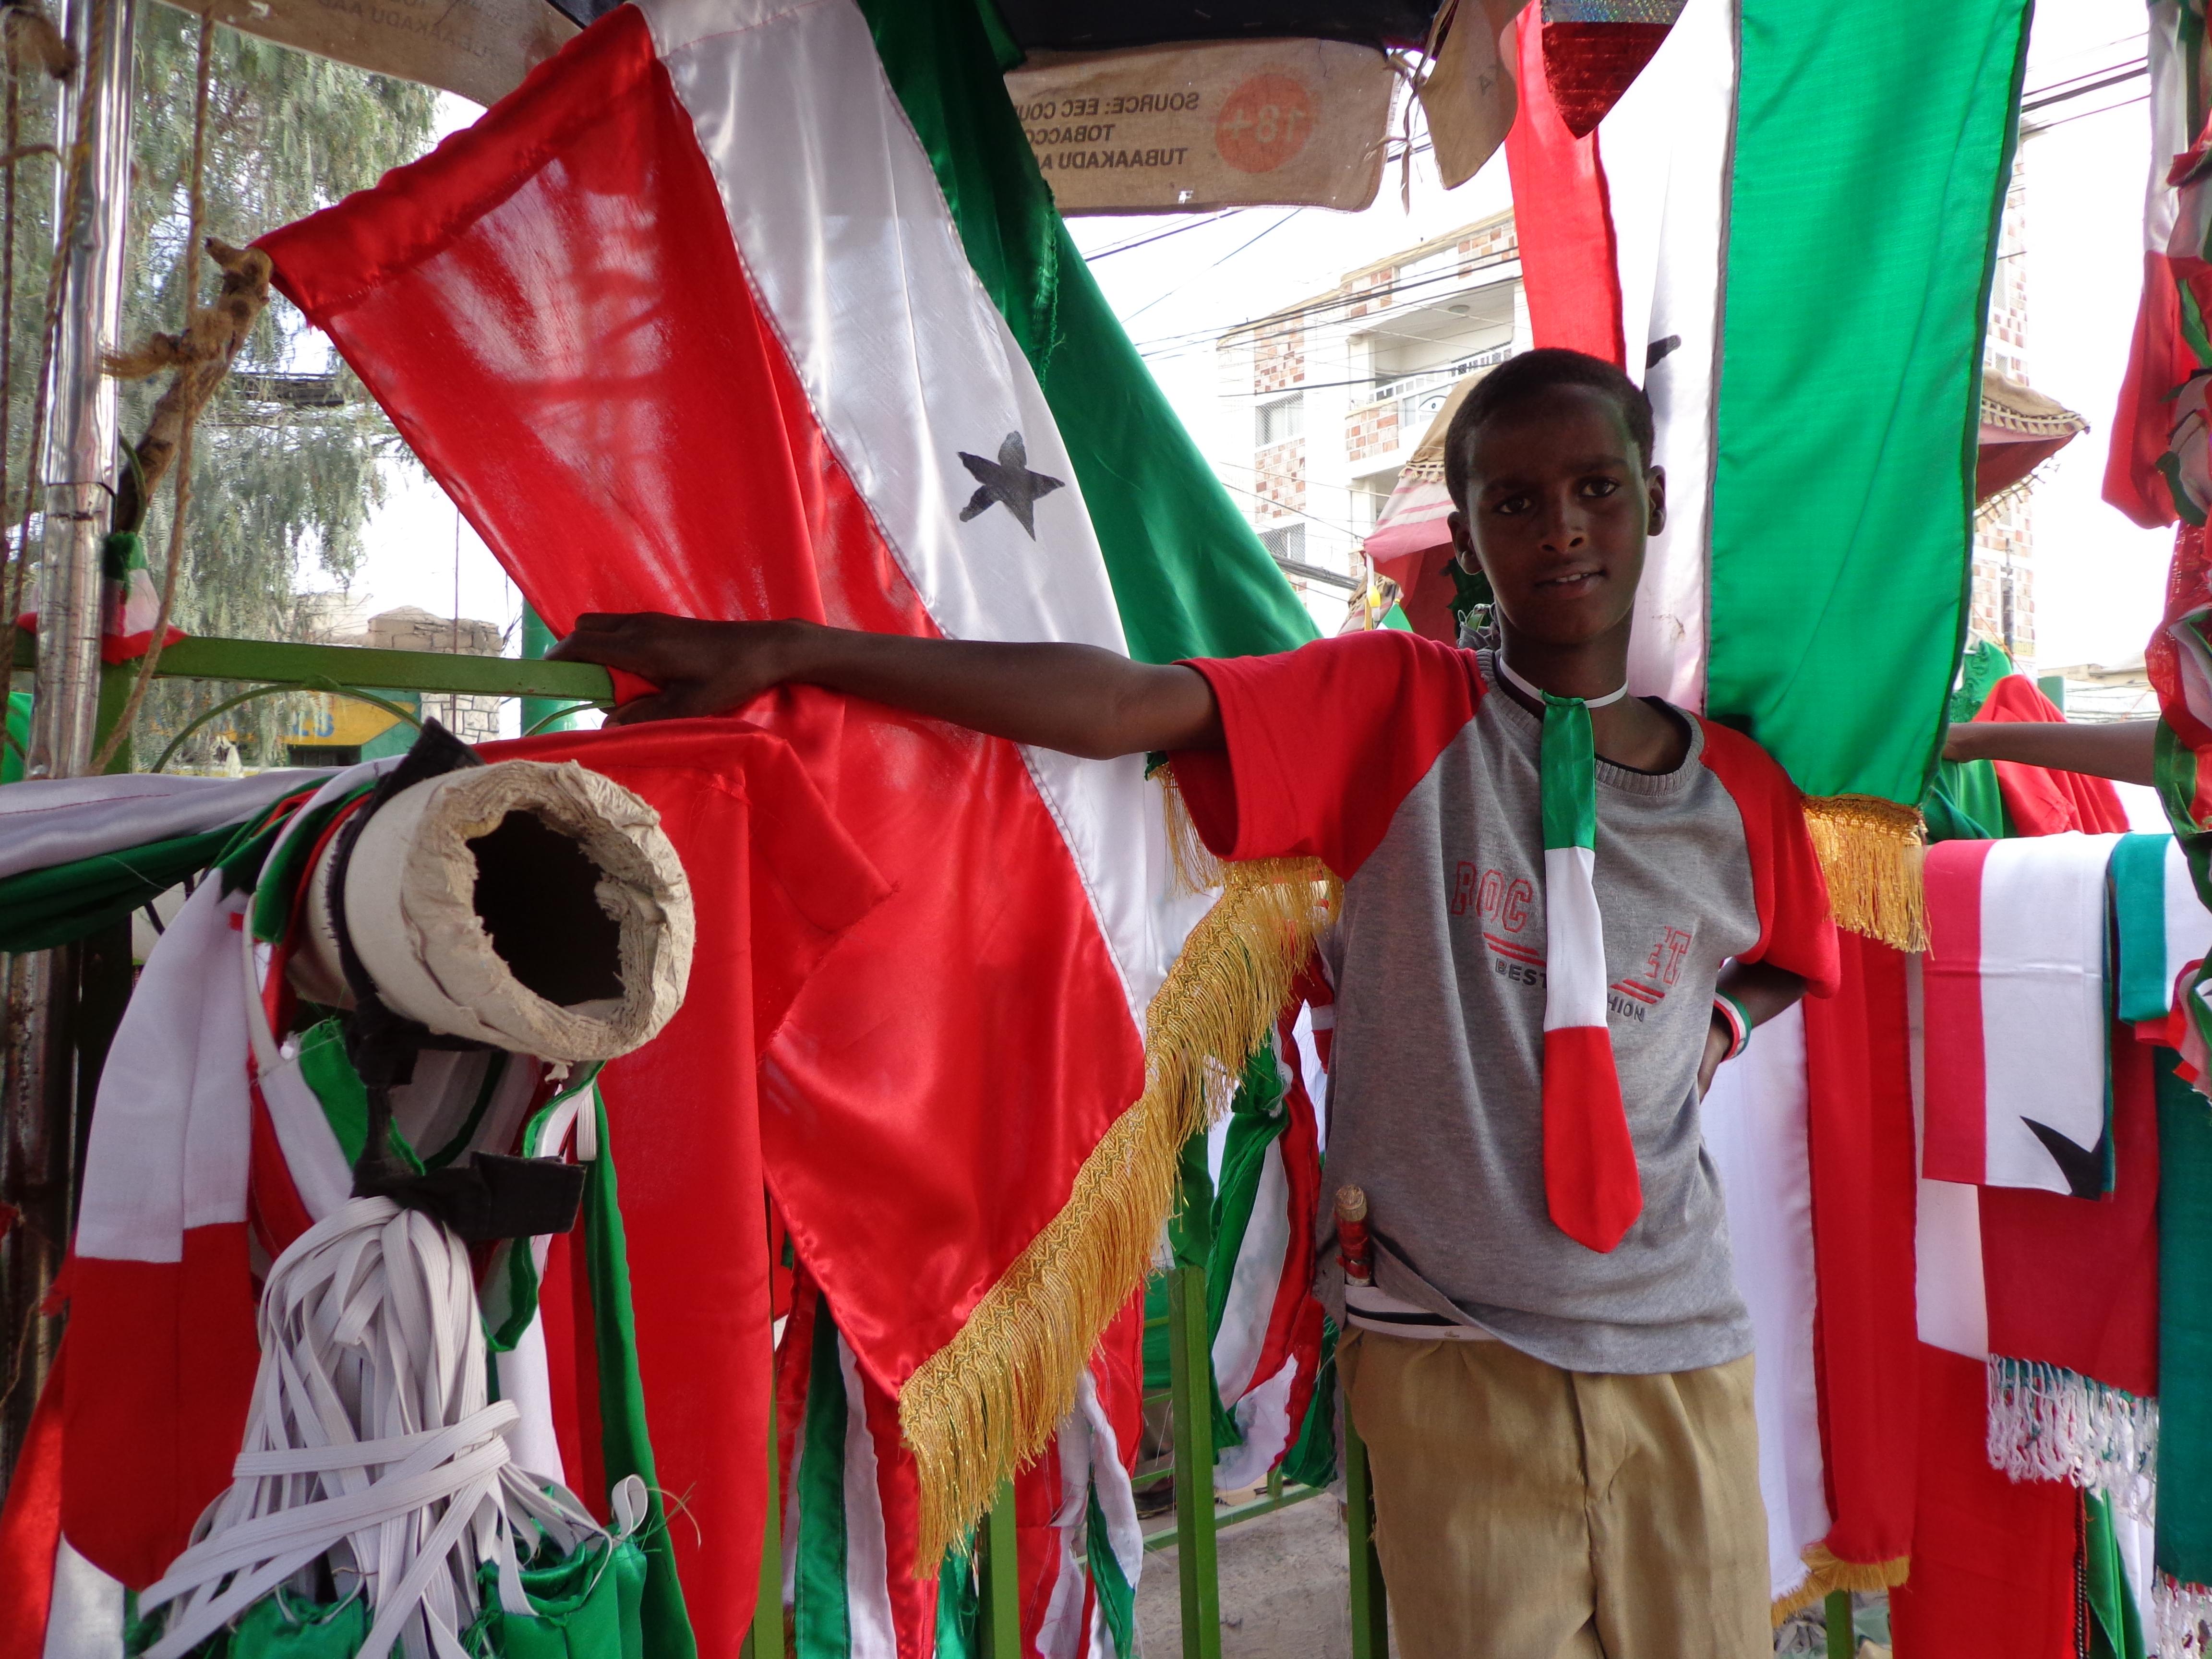 Boy selling Somaliland flags